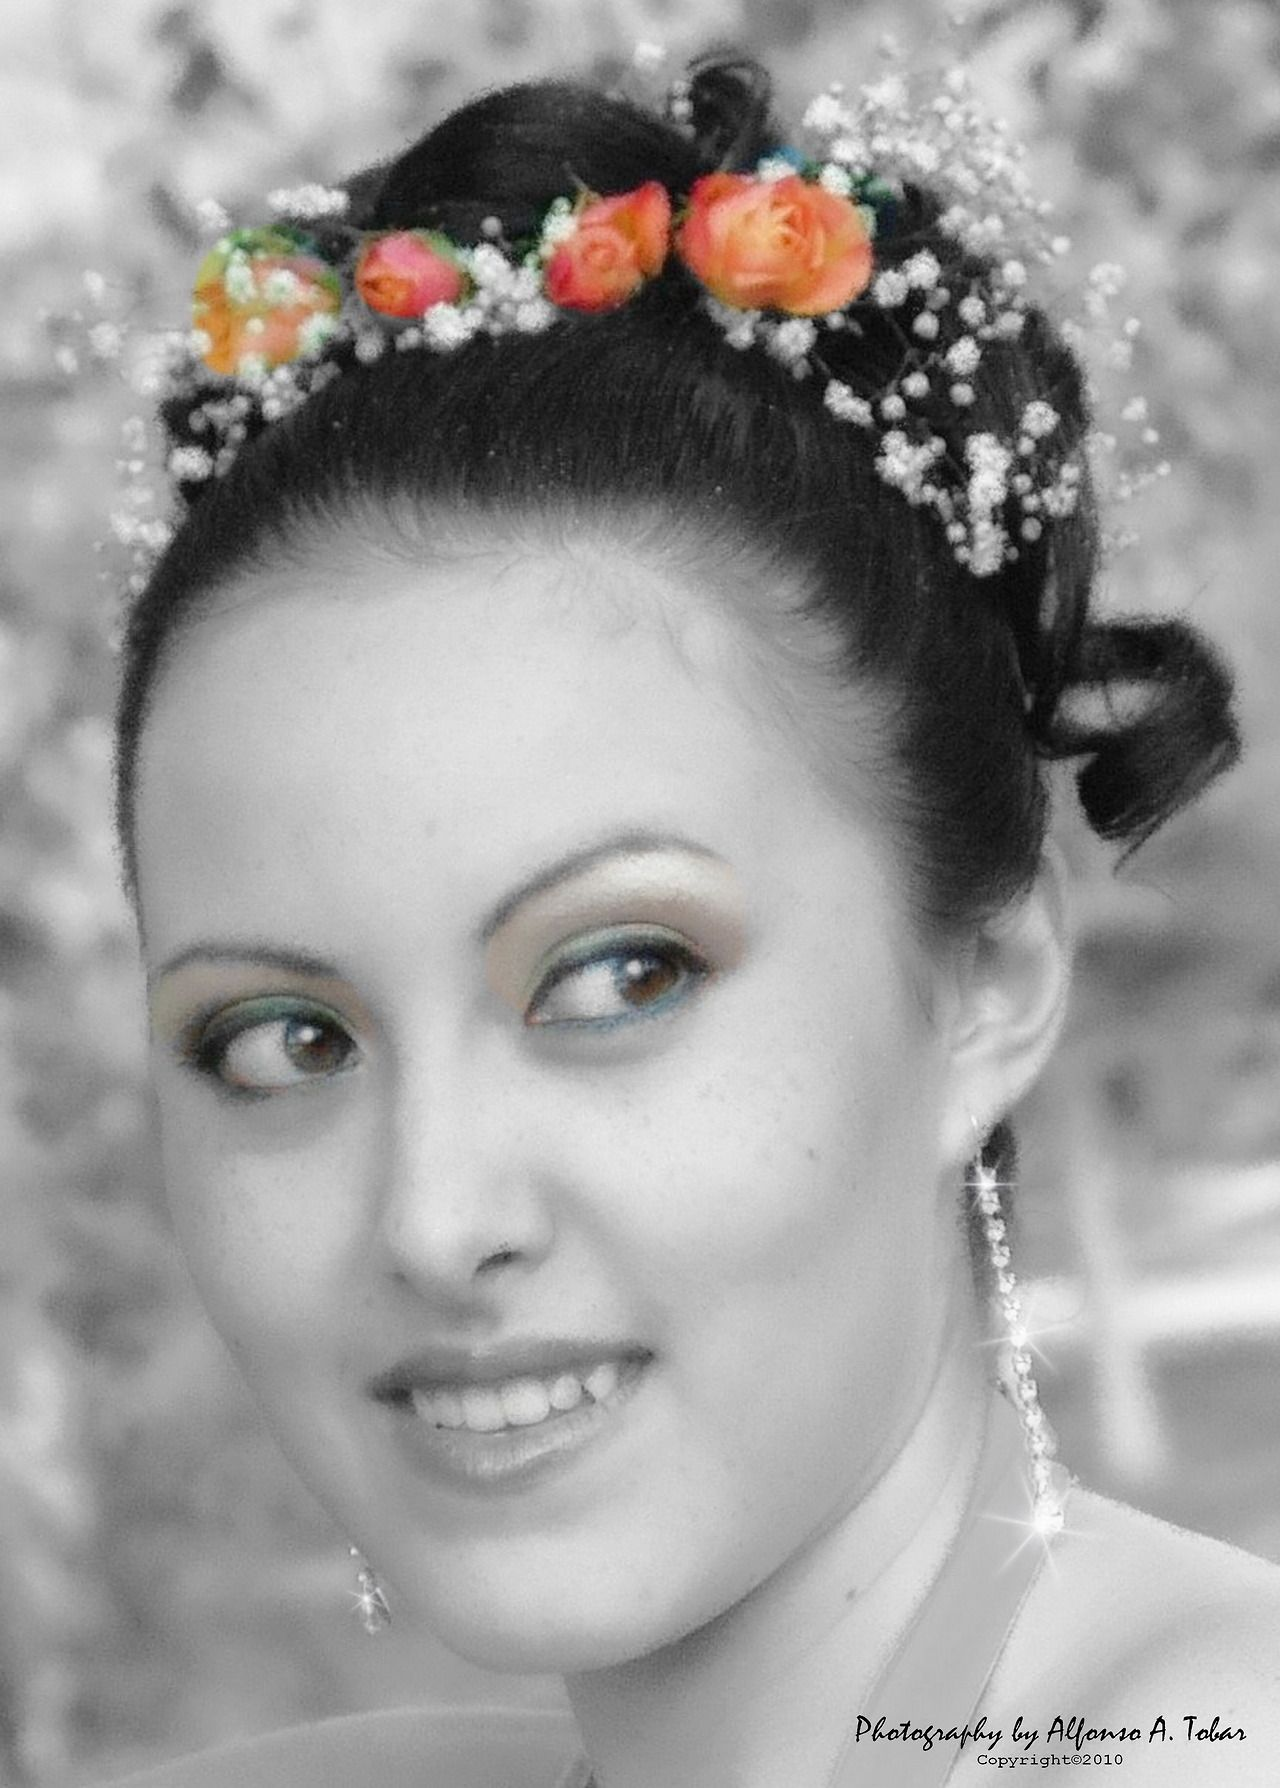 Fotografía LATIN IMAGE Photography  [http://latinimage.blogspot.com/2013/06/15-anos-sweet-16.html]